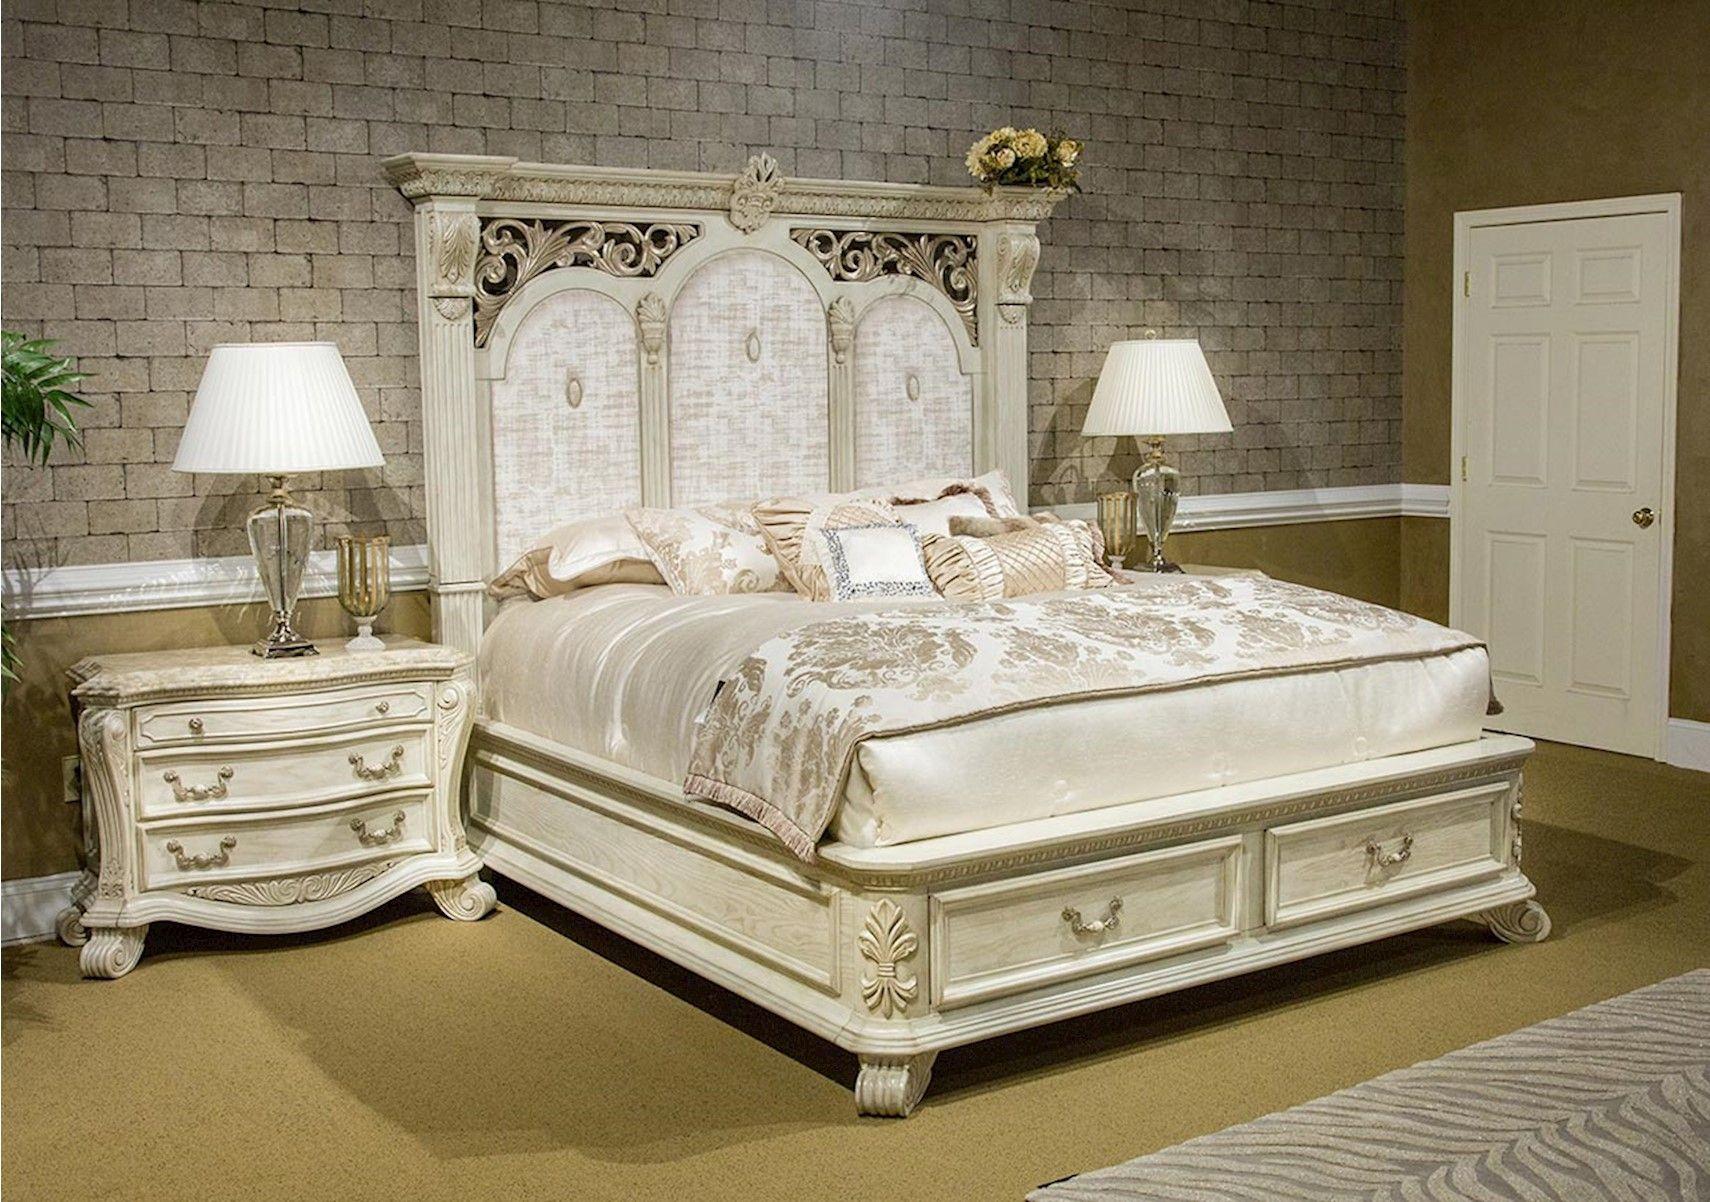 lacks villa di como 4 pc king bedroom set old world furniture